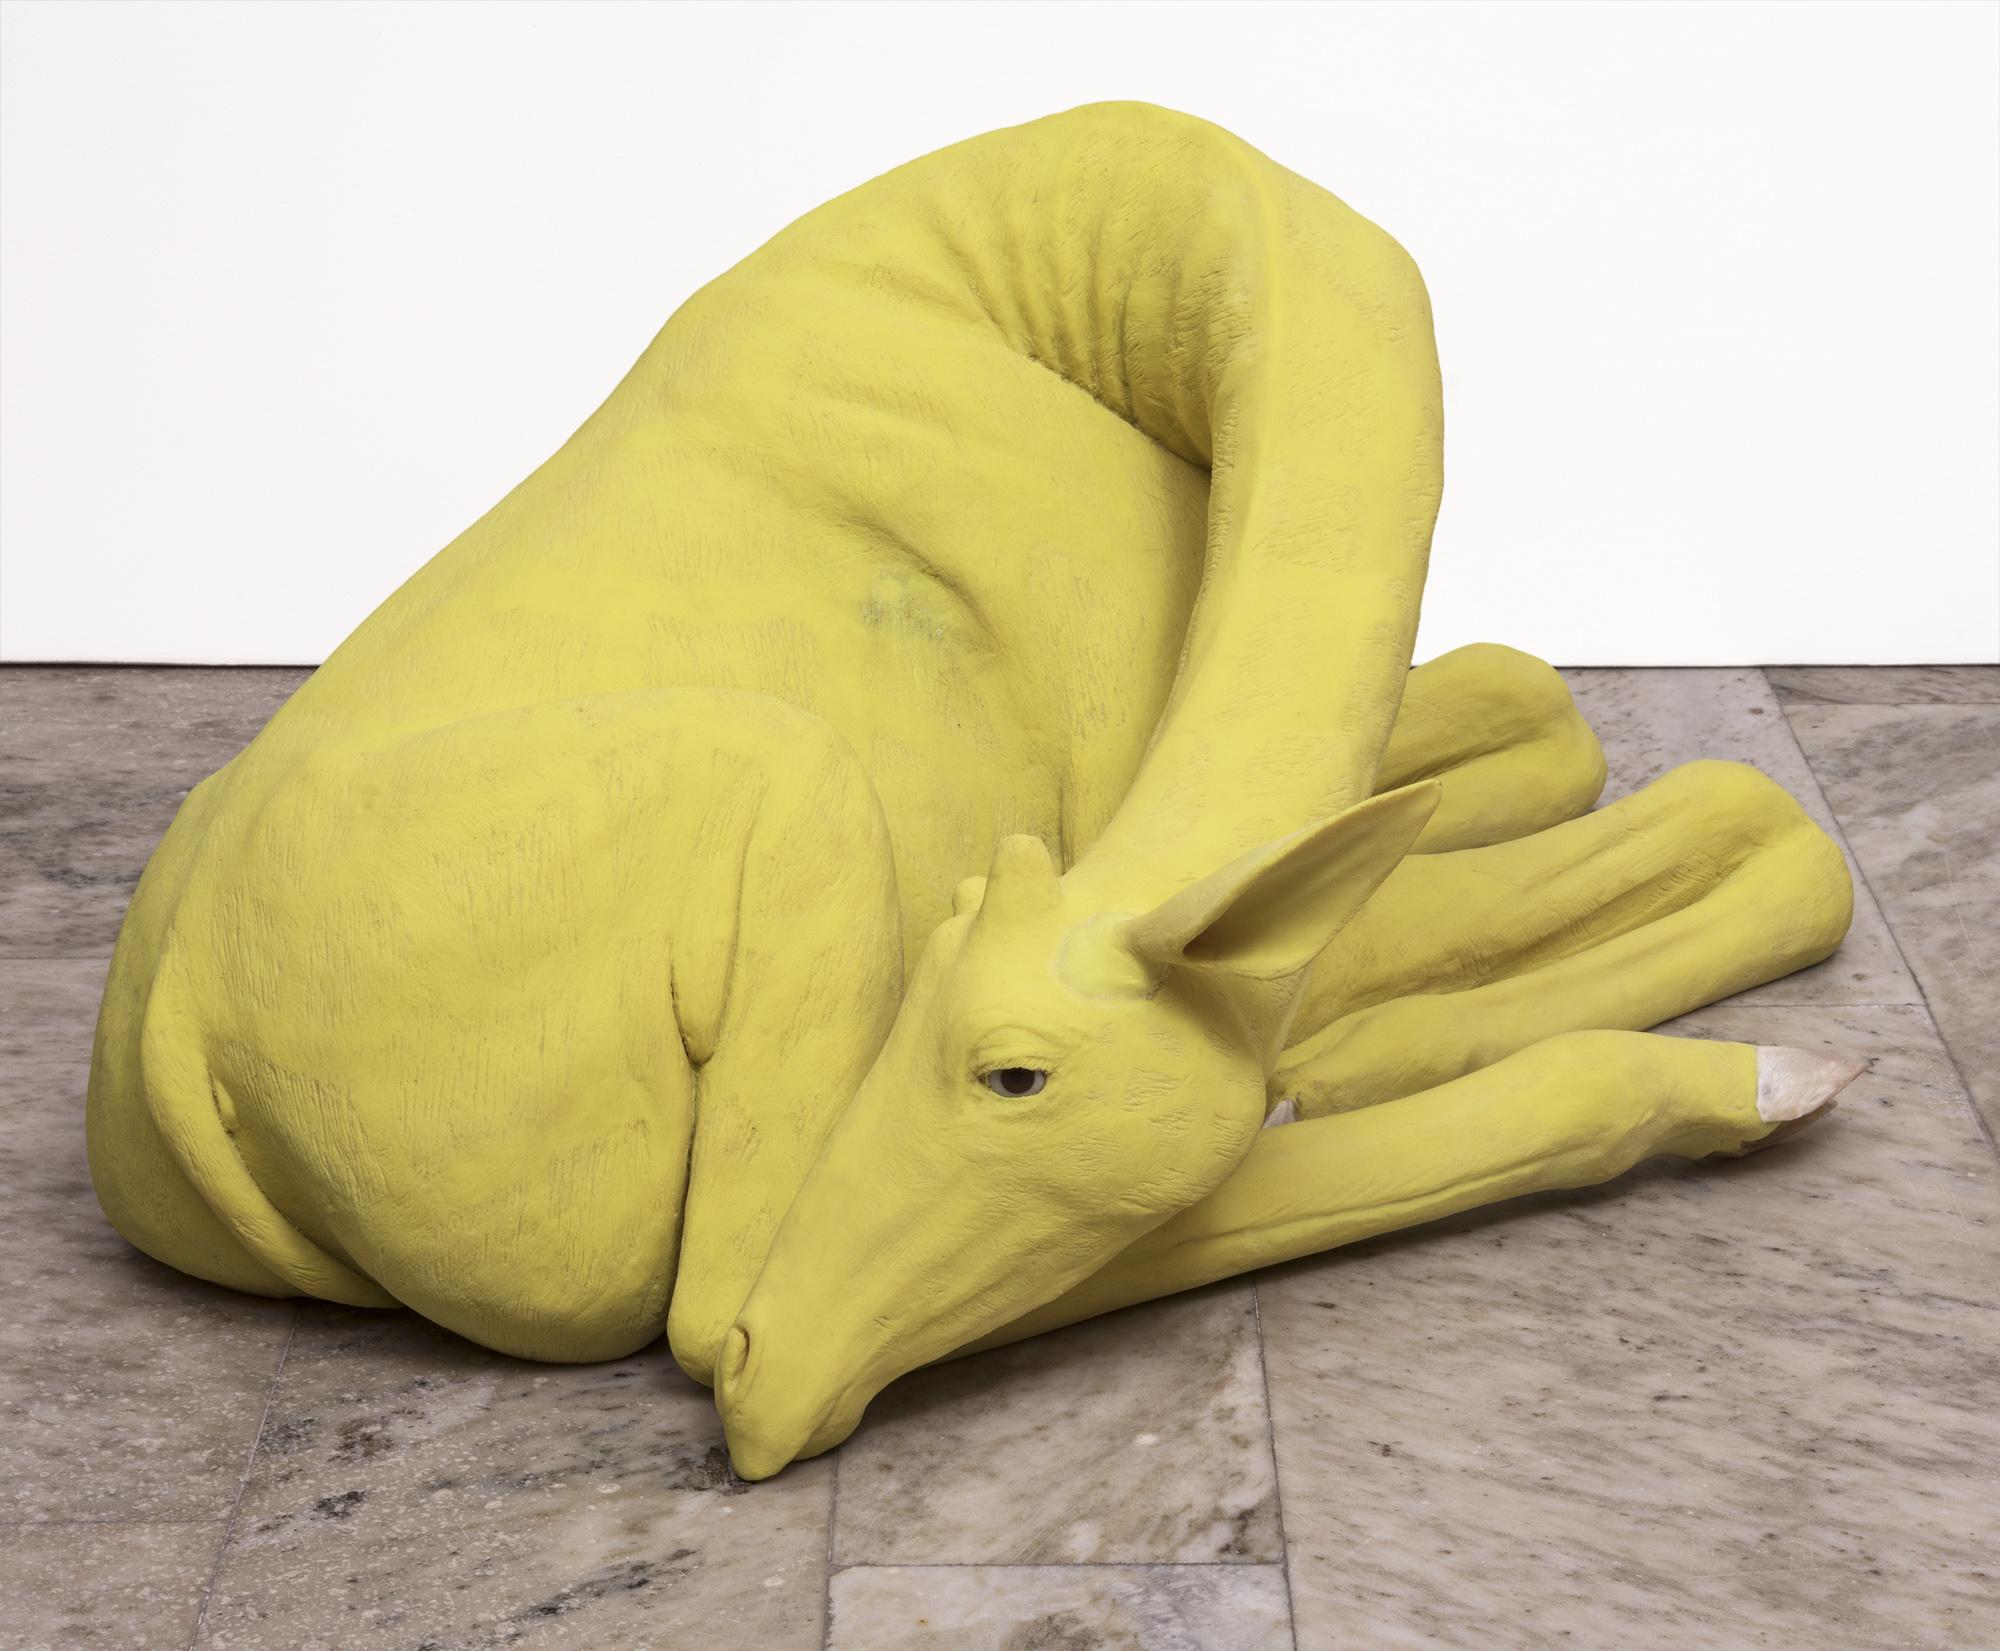 Carsten Höller   Giraffe  2018 Edition 5 + 2 AP Yellow-tinted polyurethane, cow horn, brown glass eyes 75 x 53 x 38 cm